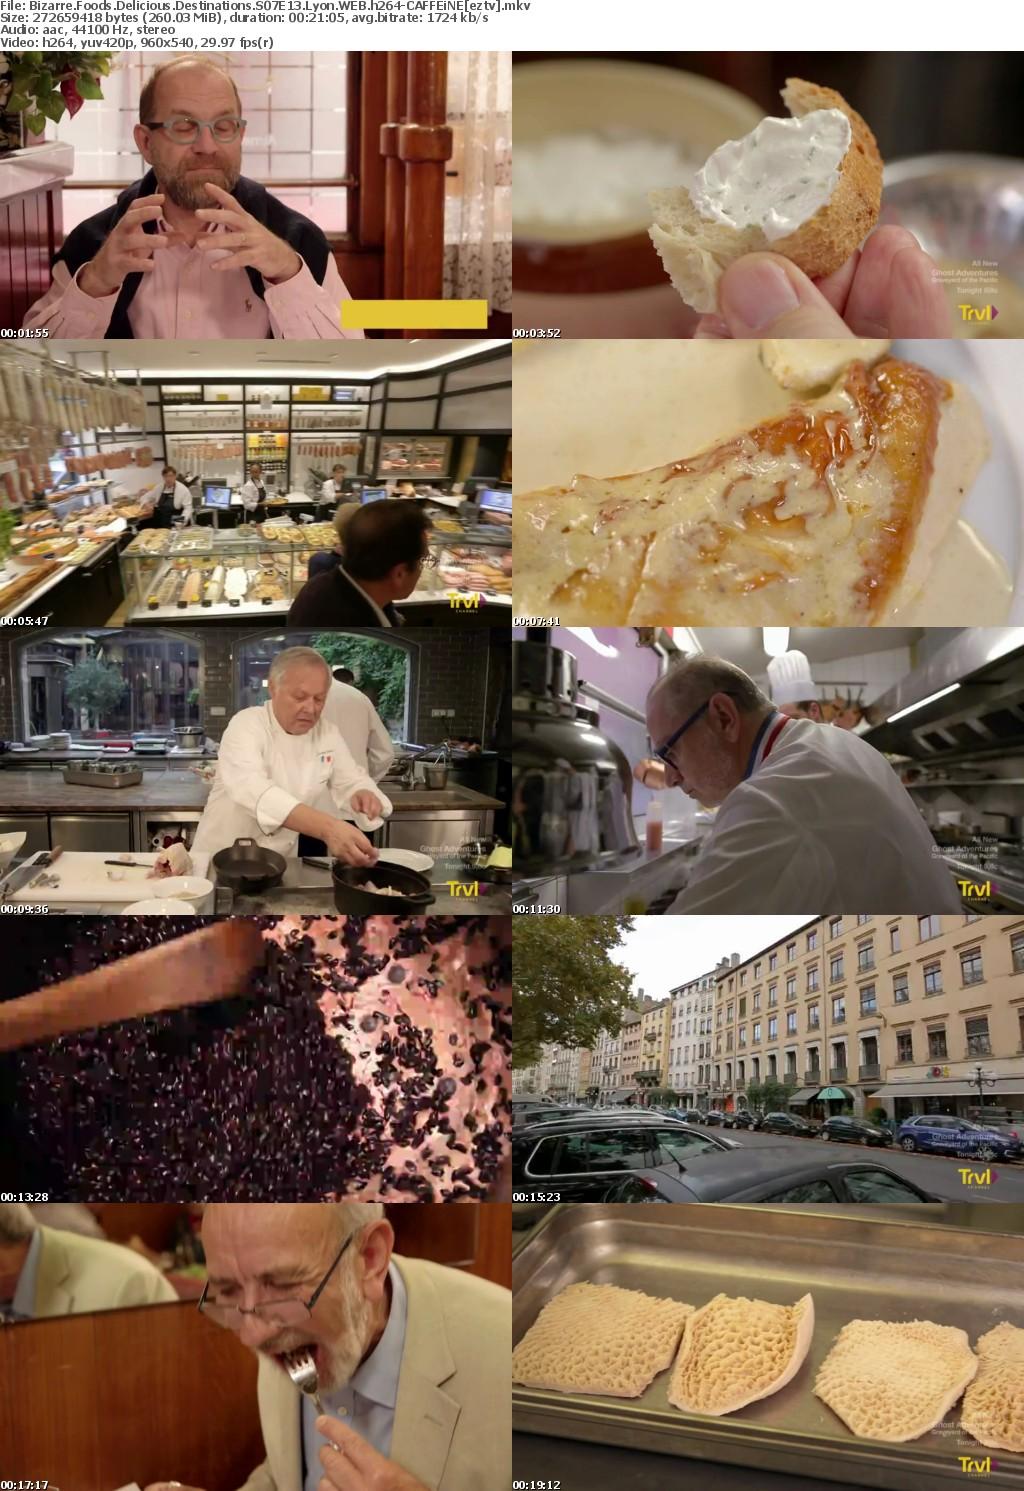 Bizarre Foods Delicious Destinations S07E13 Lyon WEB h264-CAFFEiNE